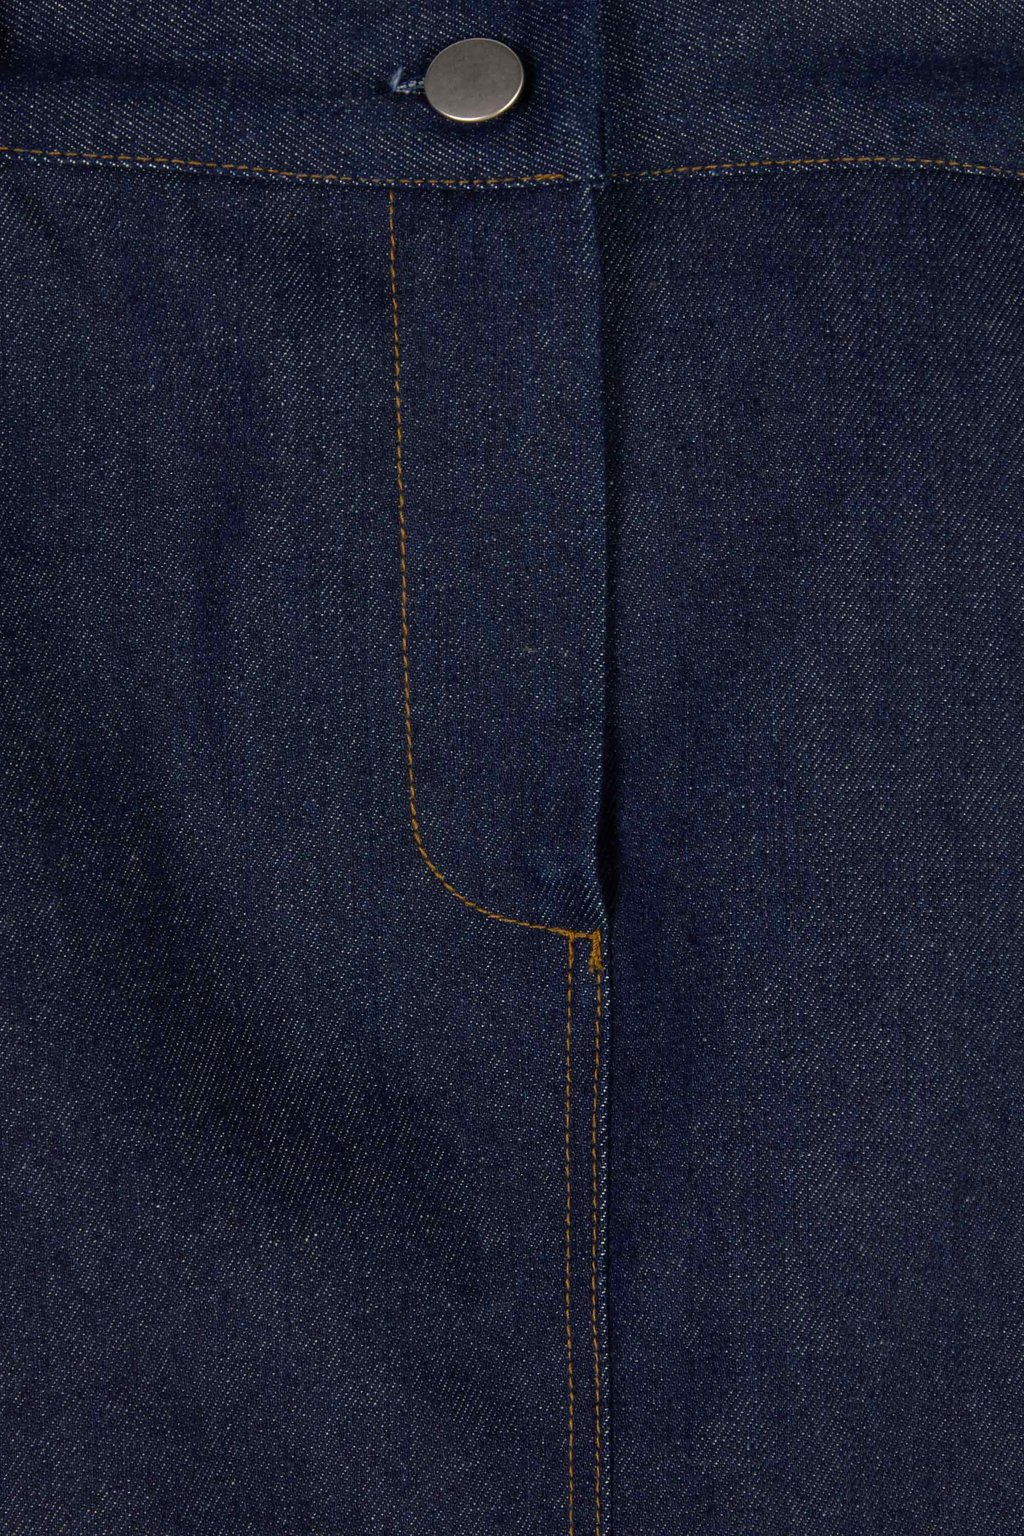 Skirt J010 Indigo 6